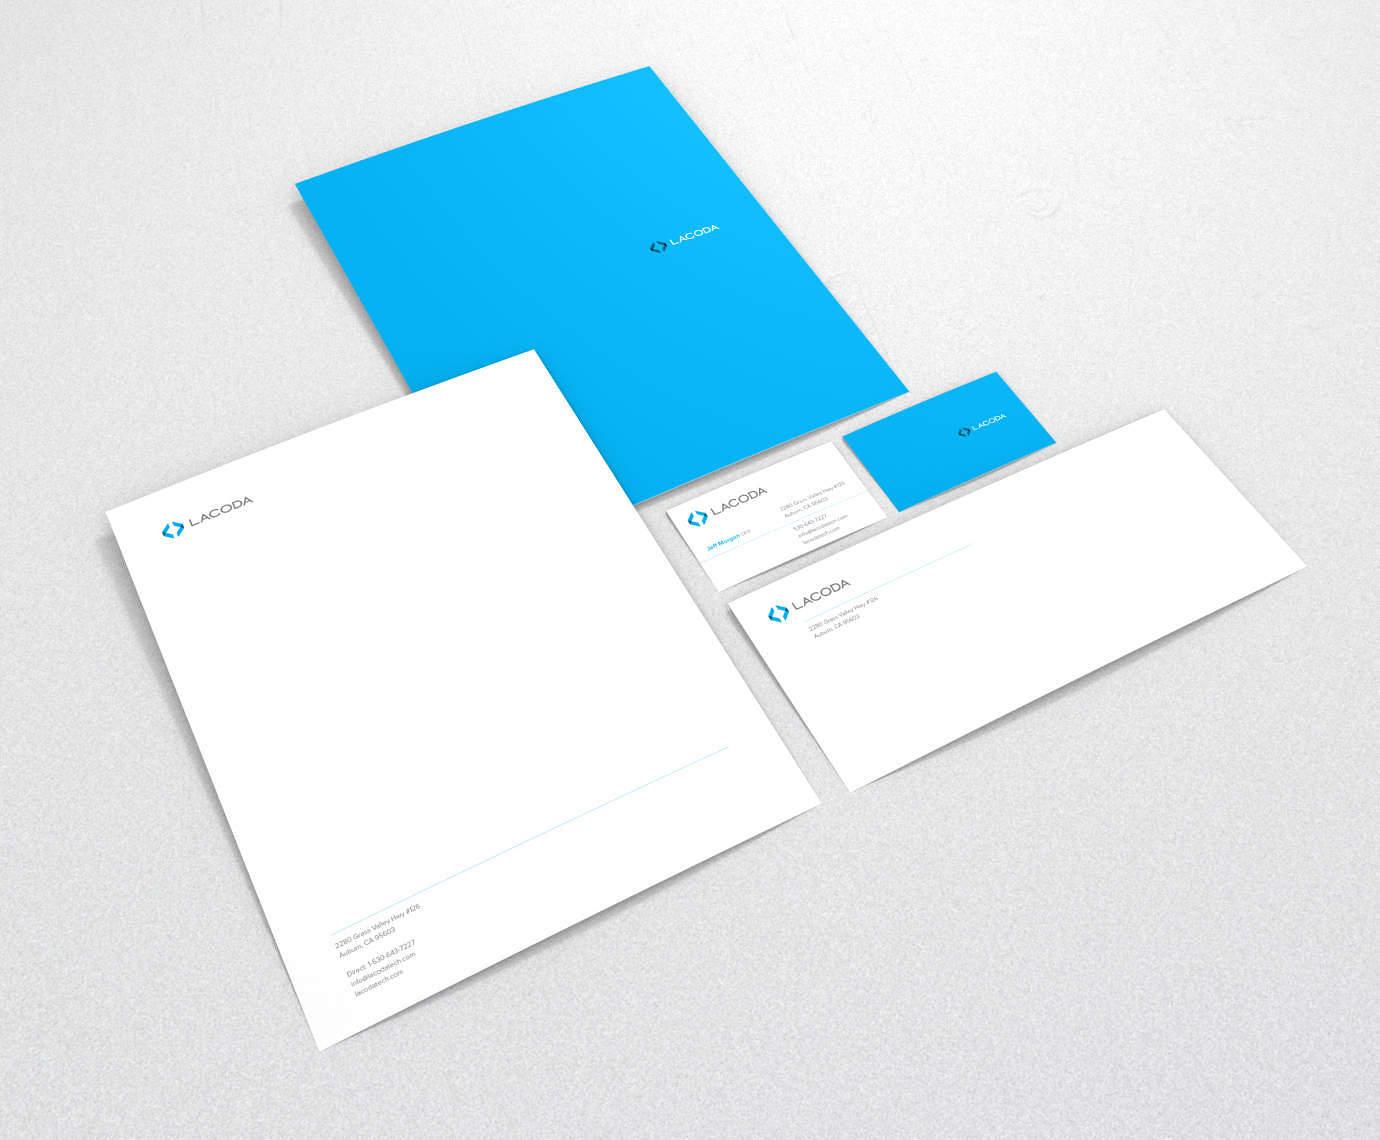 software-development-engineering-firm-logo-design-business-card